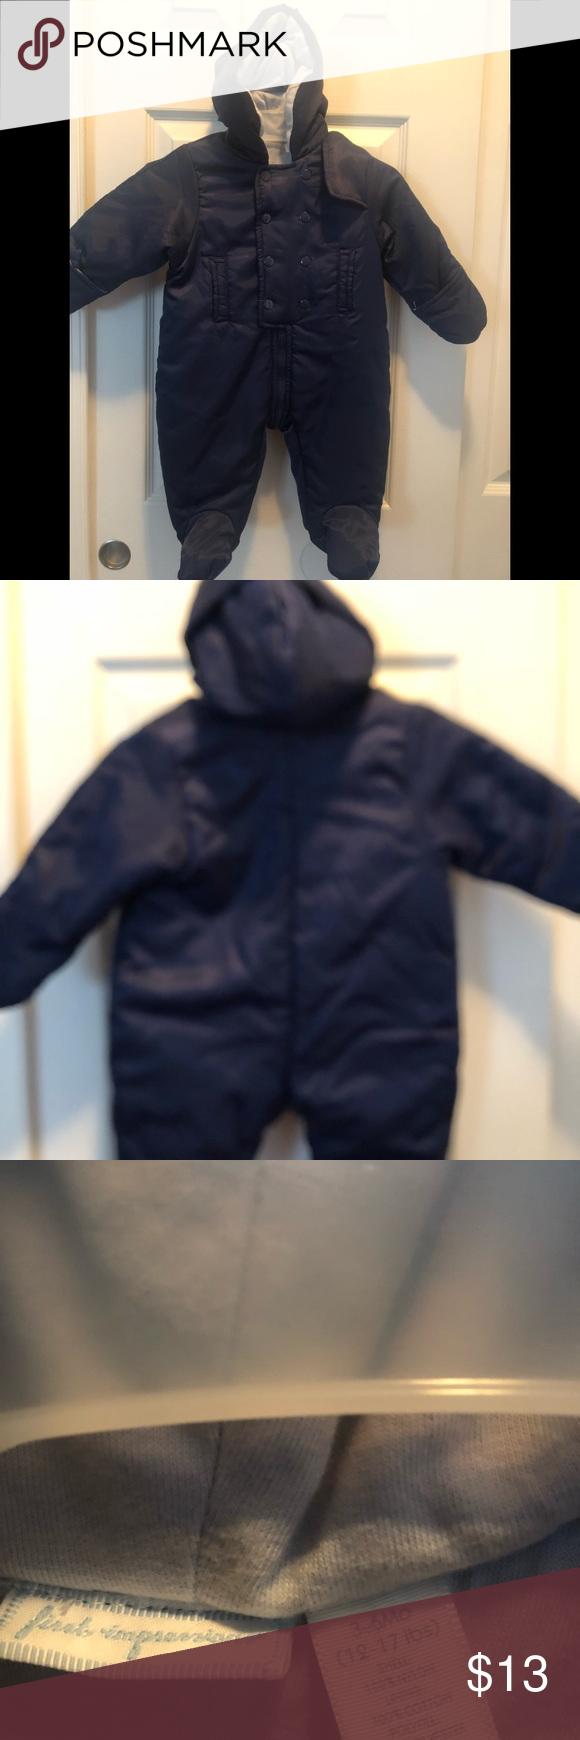 fa5ebd8fd561 Baby s Snow Suit